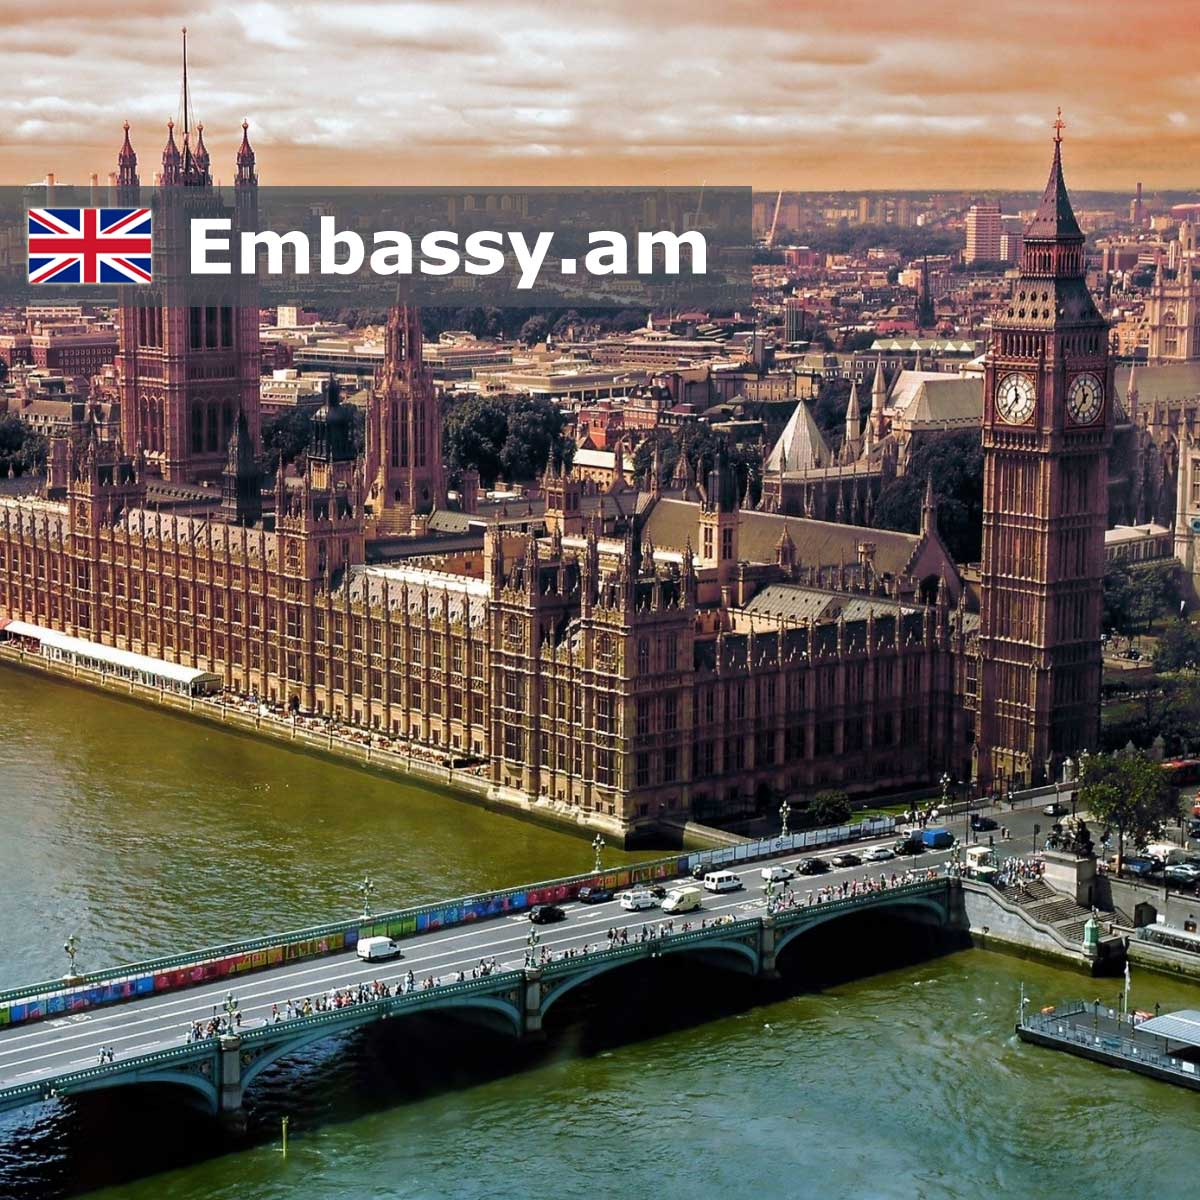 Hotels in UK - Embassy.am